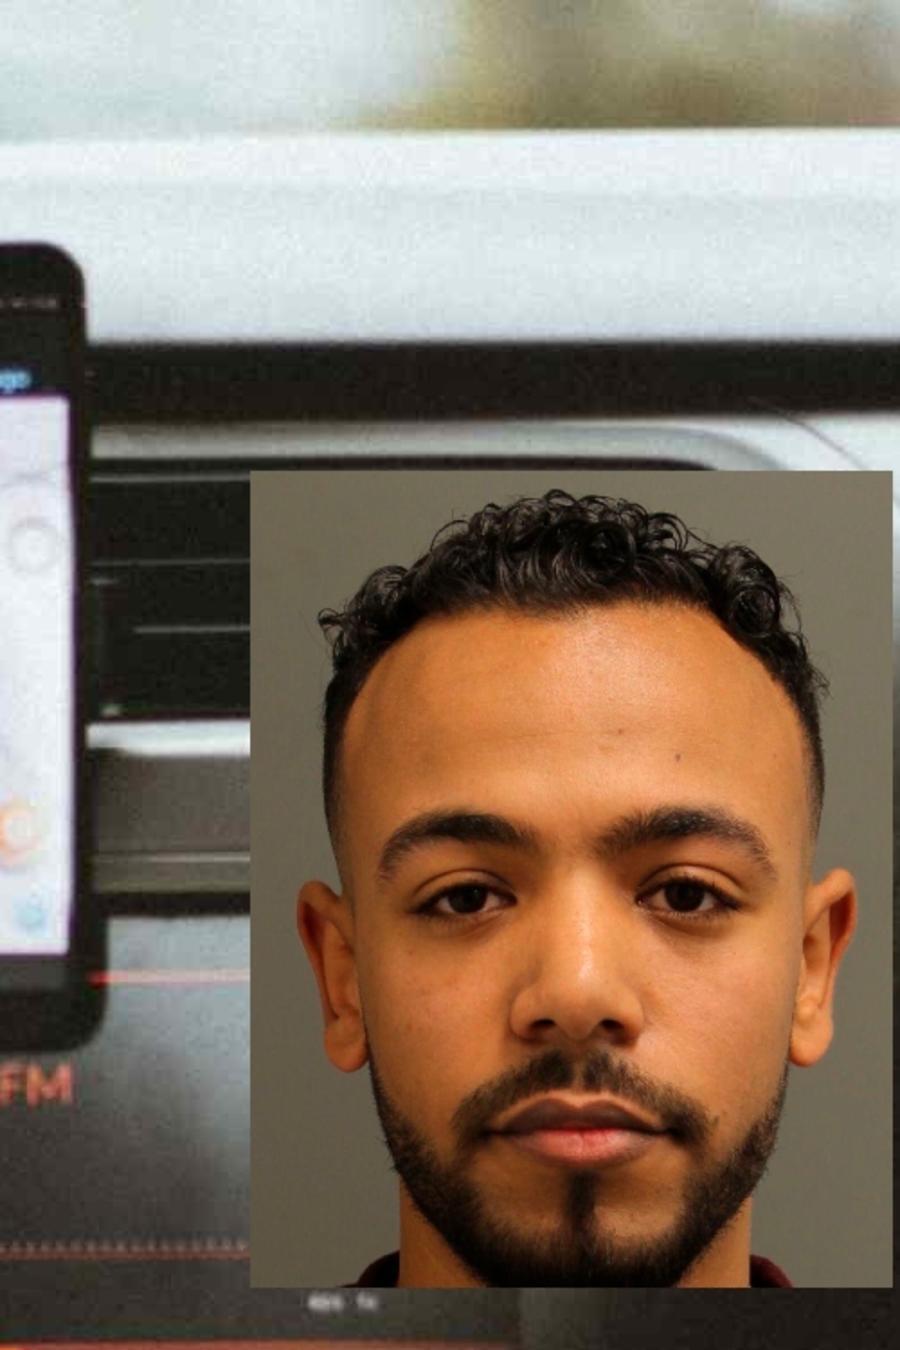 Ahmed Elgaafary, declarado culpable de violar a una mujer ebria que recogió en un casino cerca de Filadelfia.